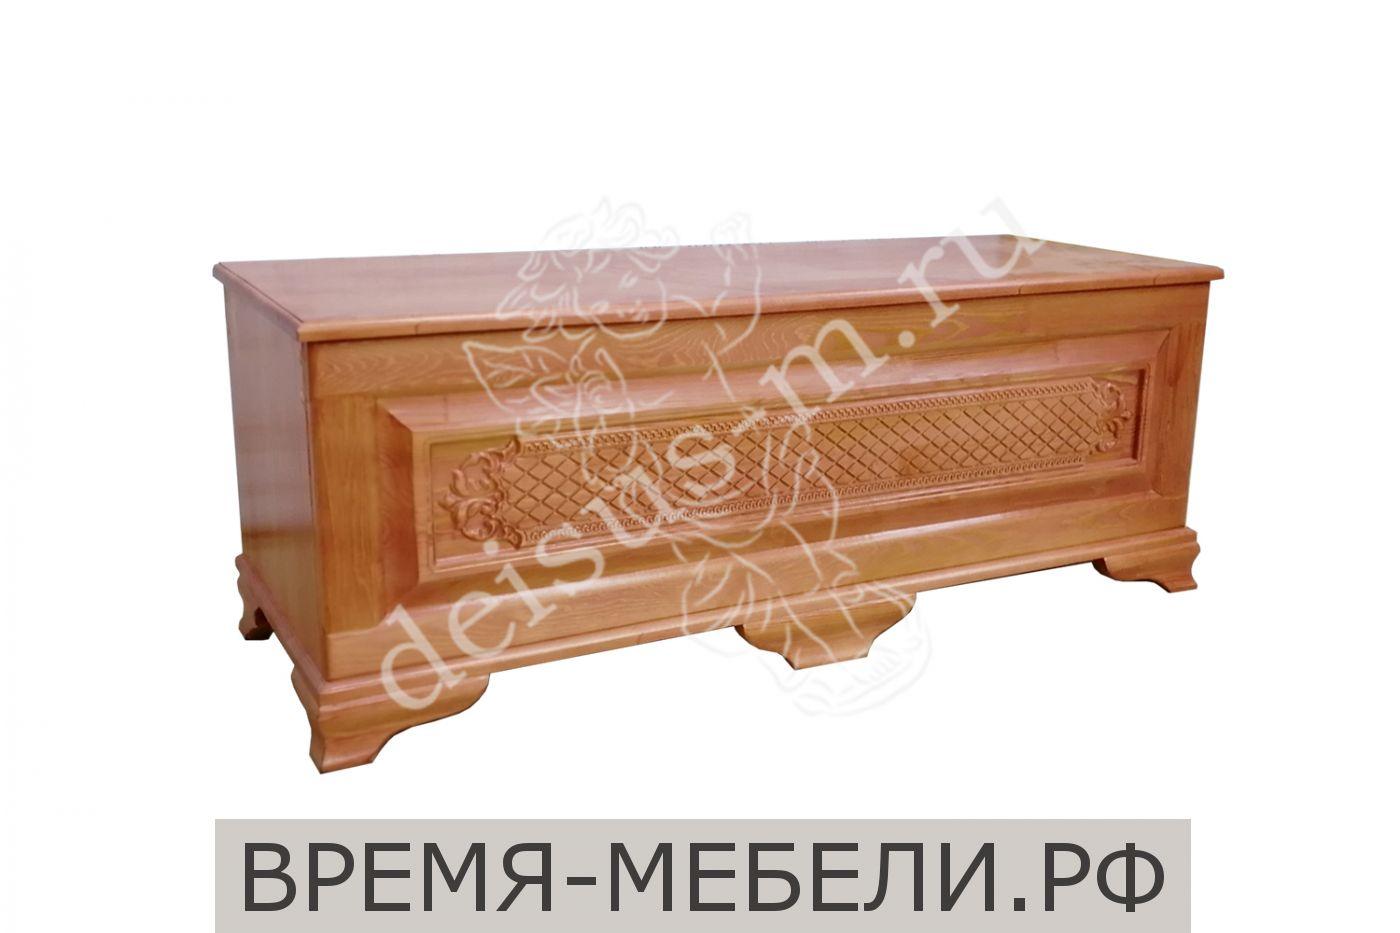 Сундук Купец-М